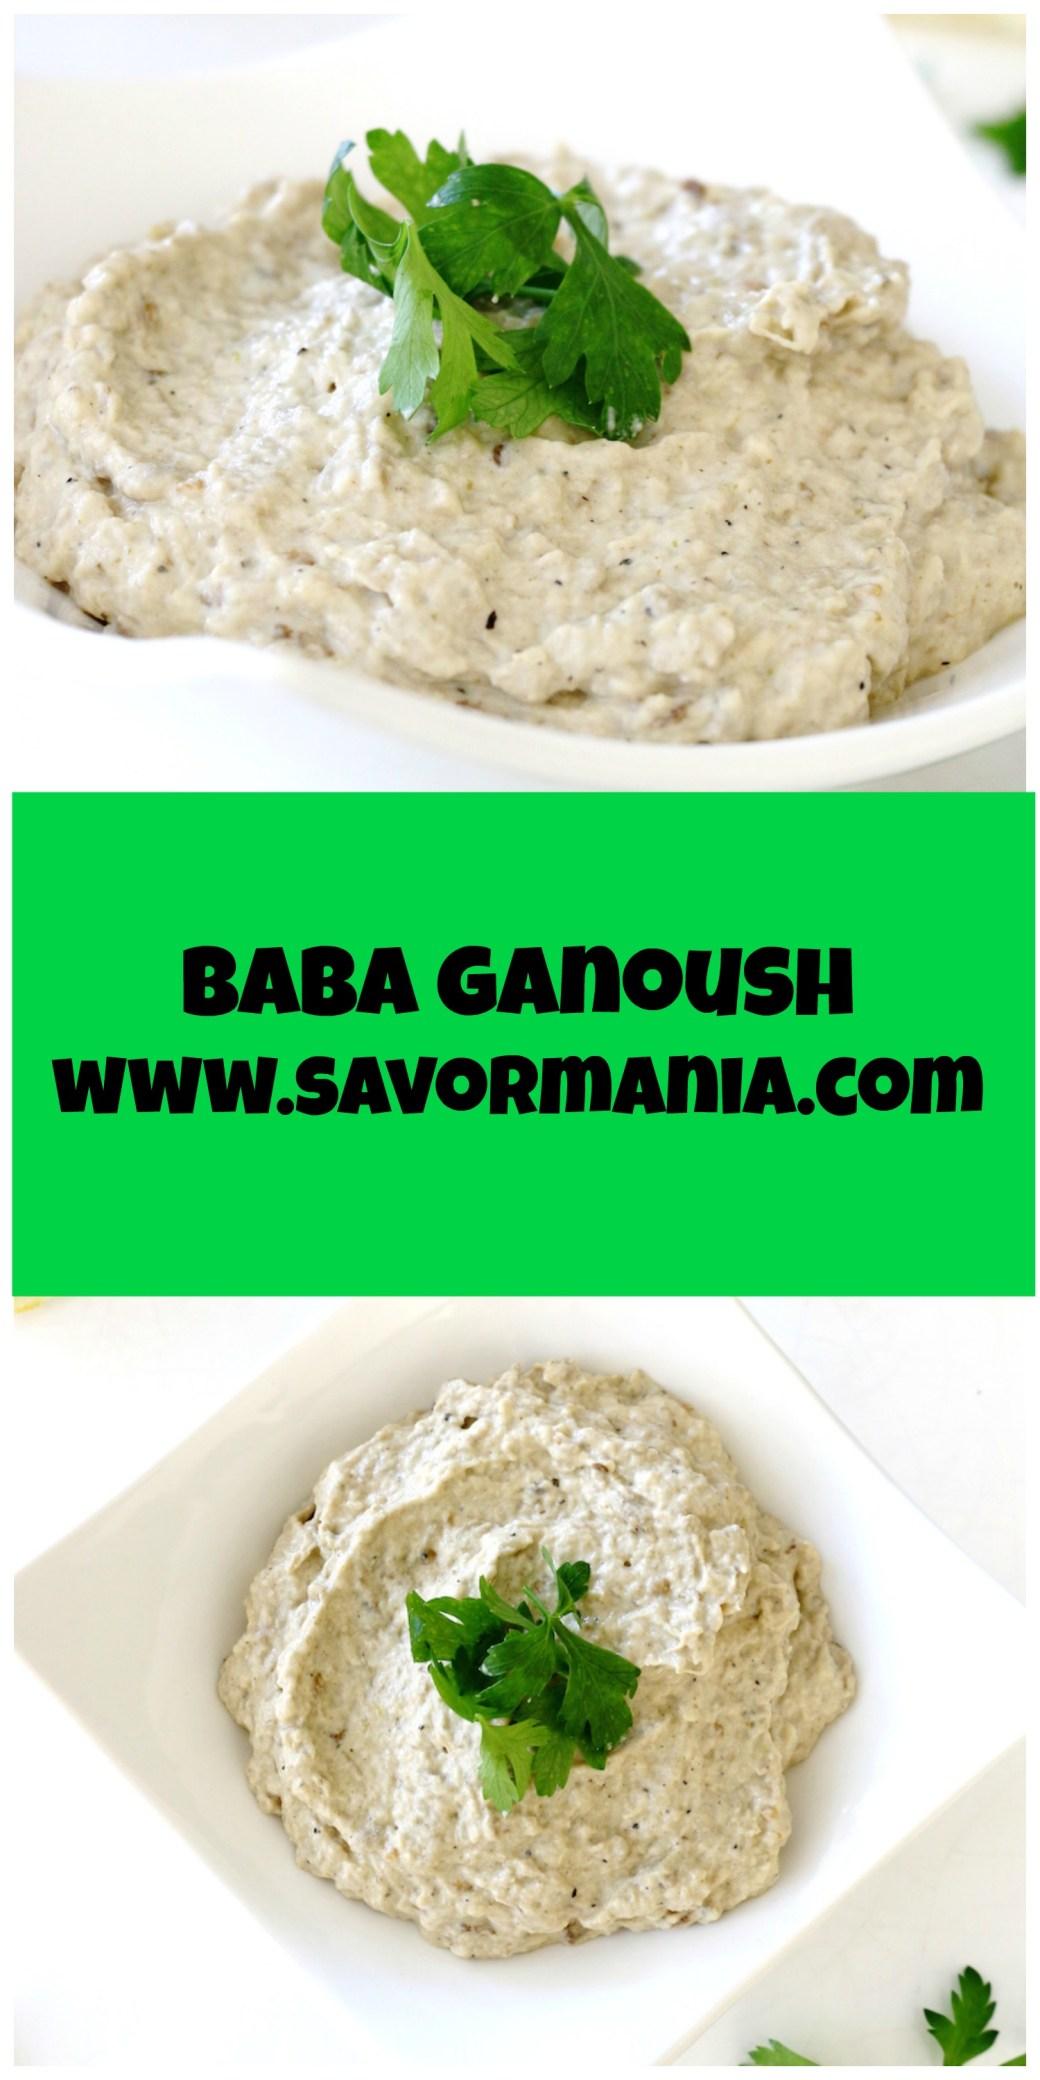 baba ganoush   www.savormania.com